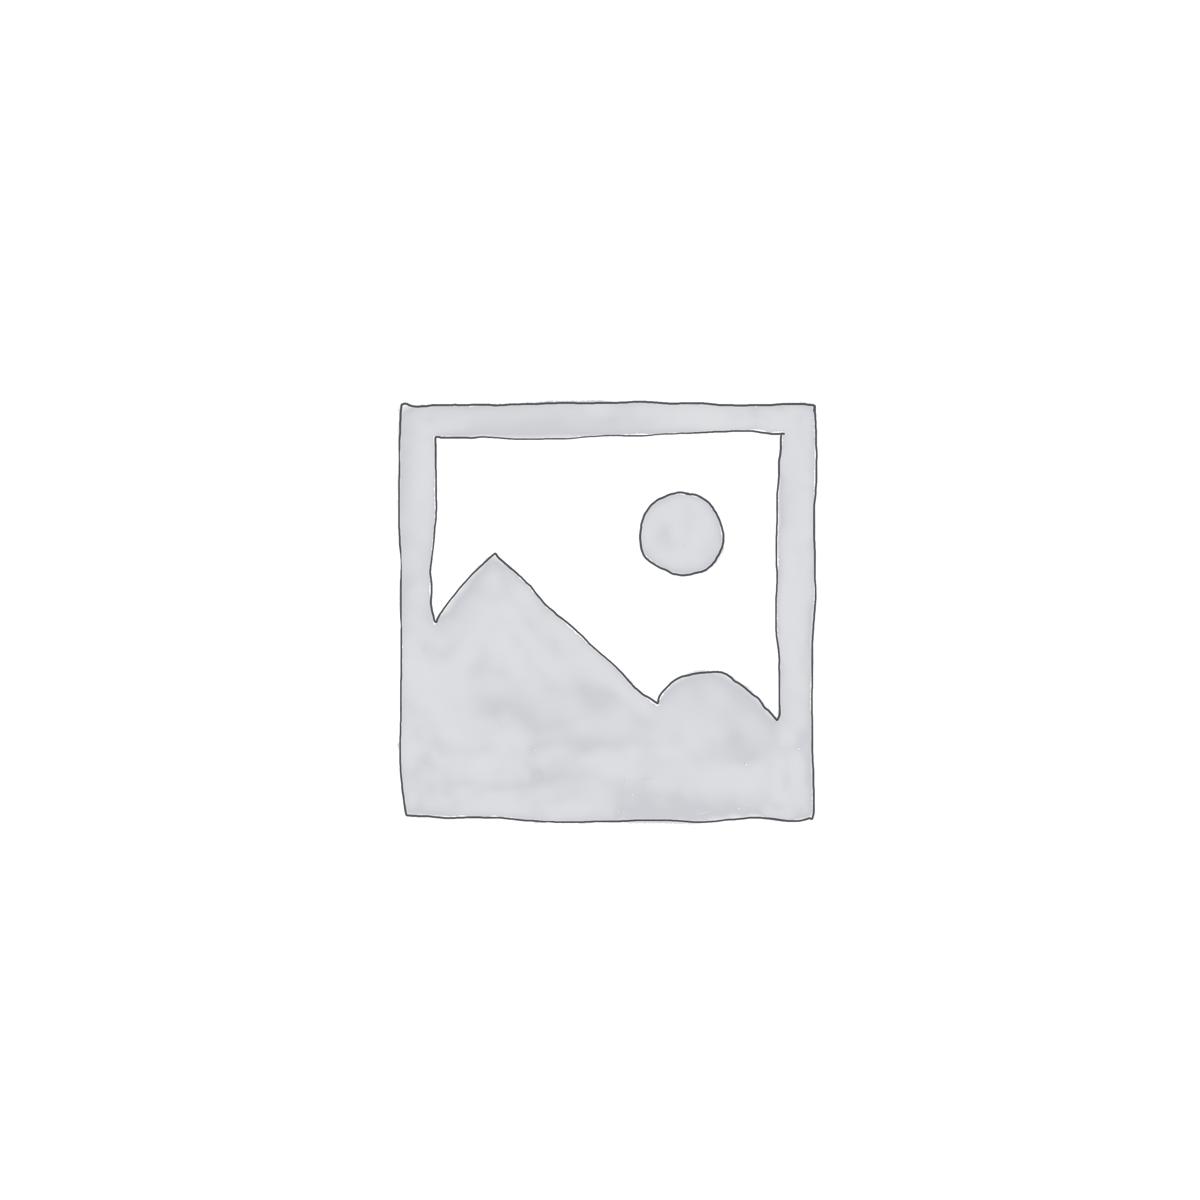 3D Look Pink Cherry Blossom Landscape Wallpaper Mural